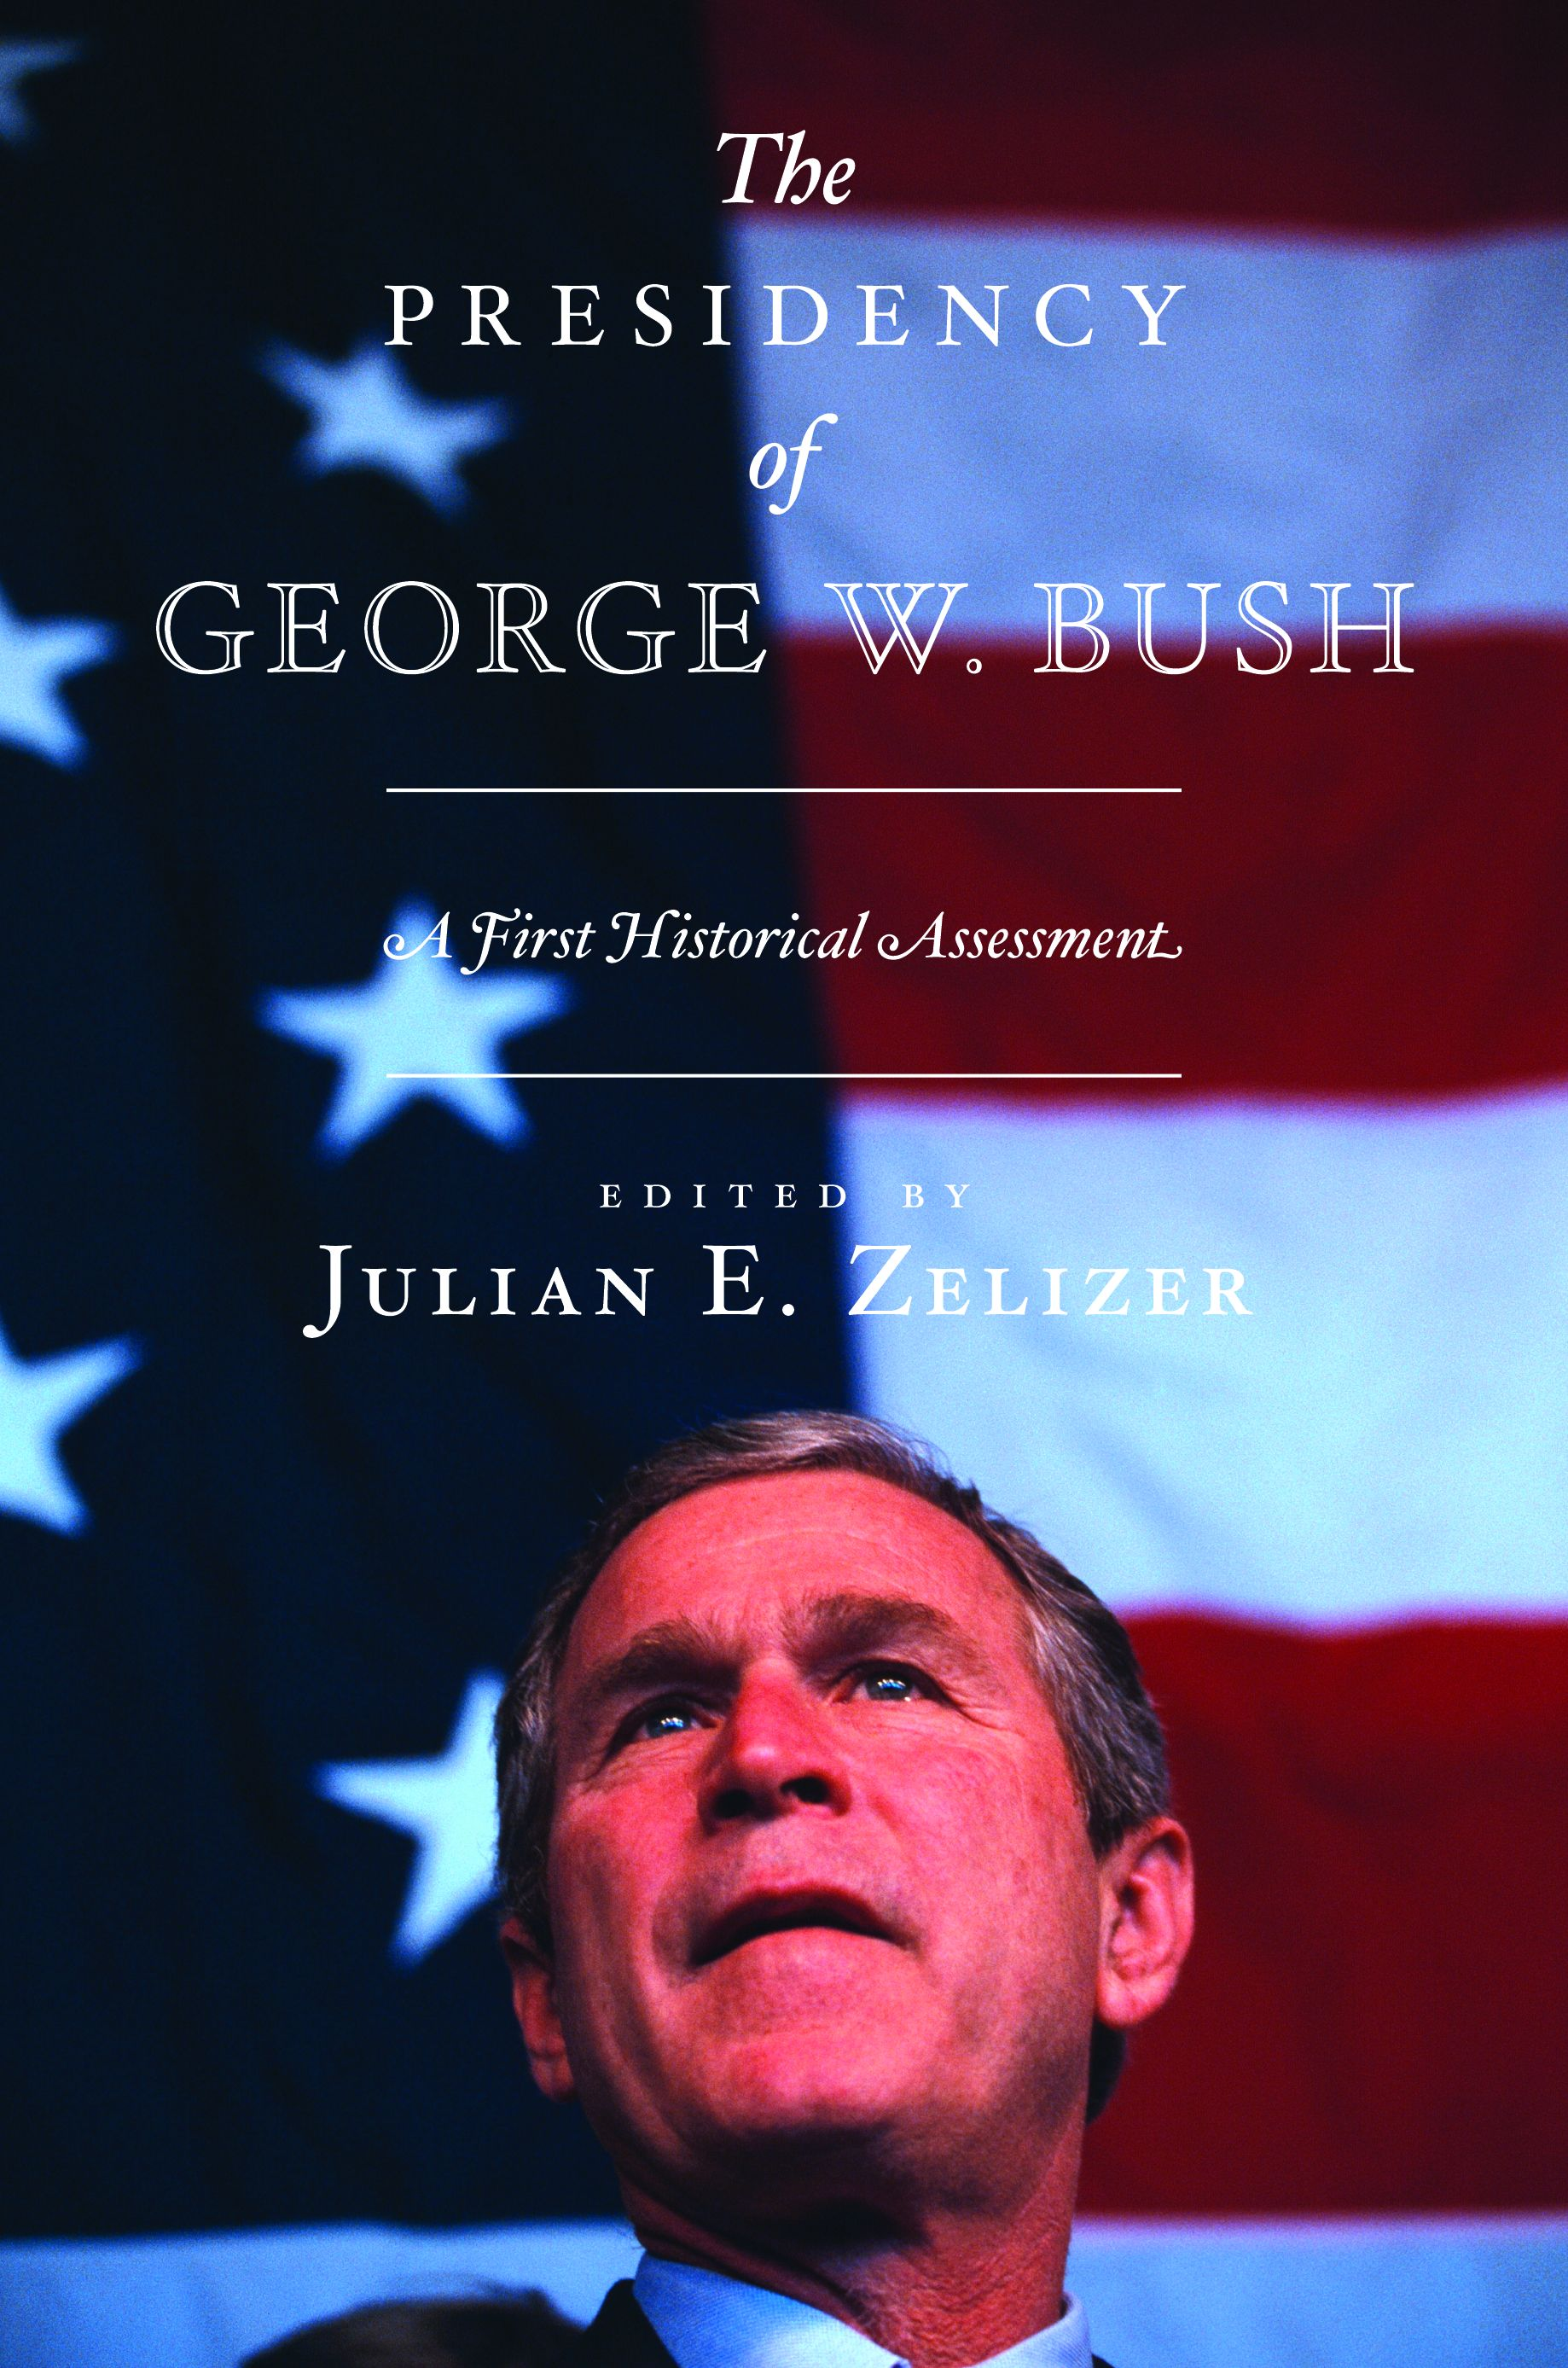 The Presidency of George W. Bush